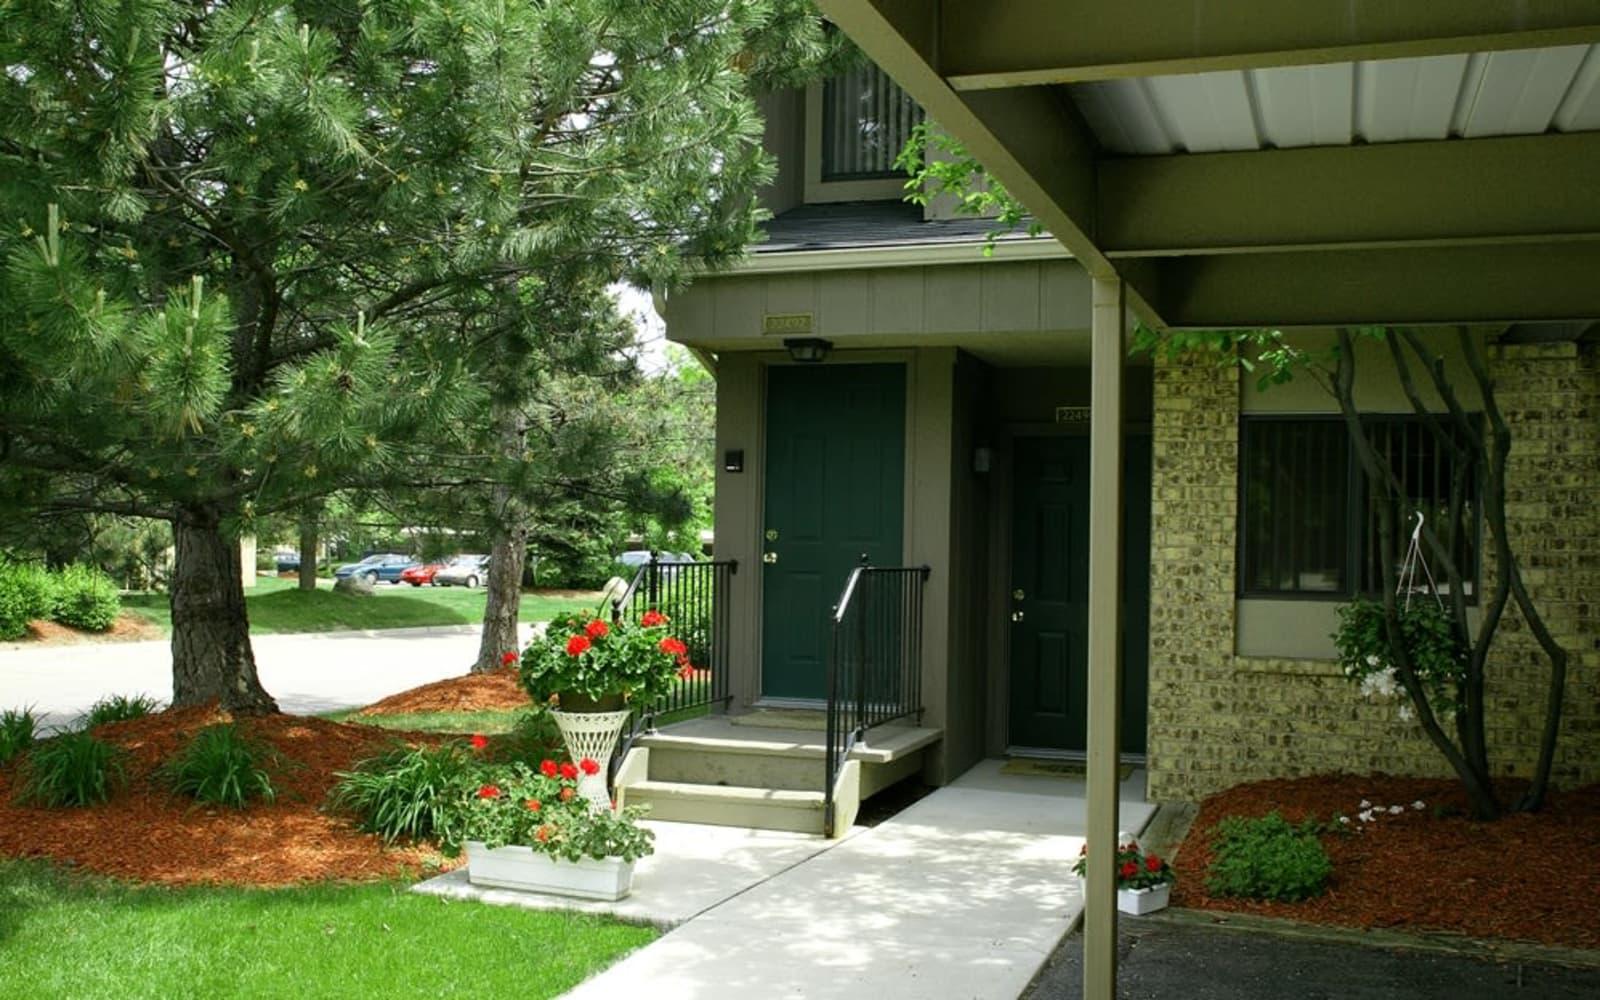 Walkway into an apartment in Farmington/Farmington Hills, Michigan at Fairmont Park Apartments